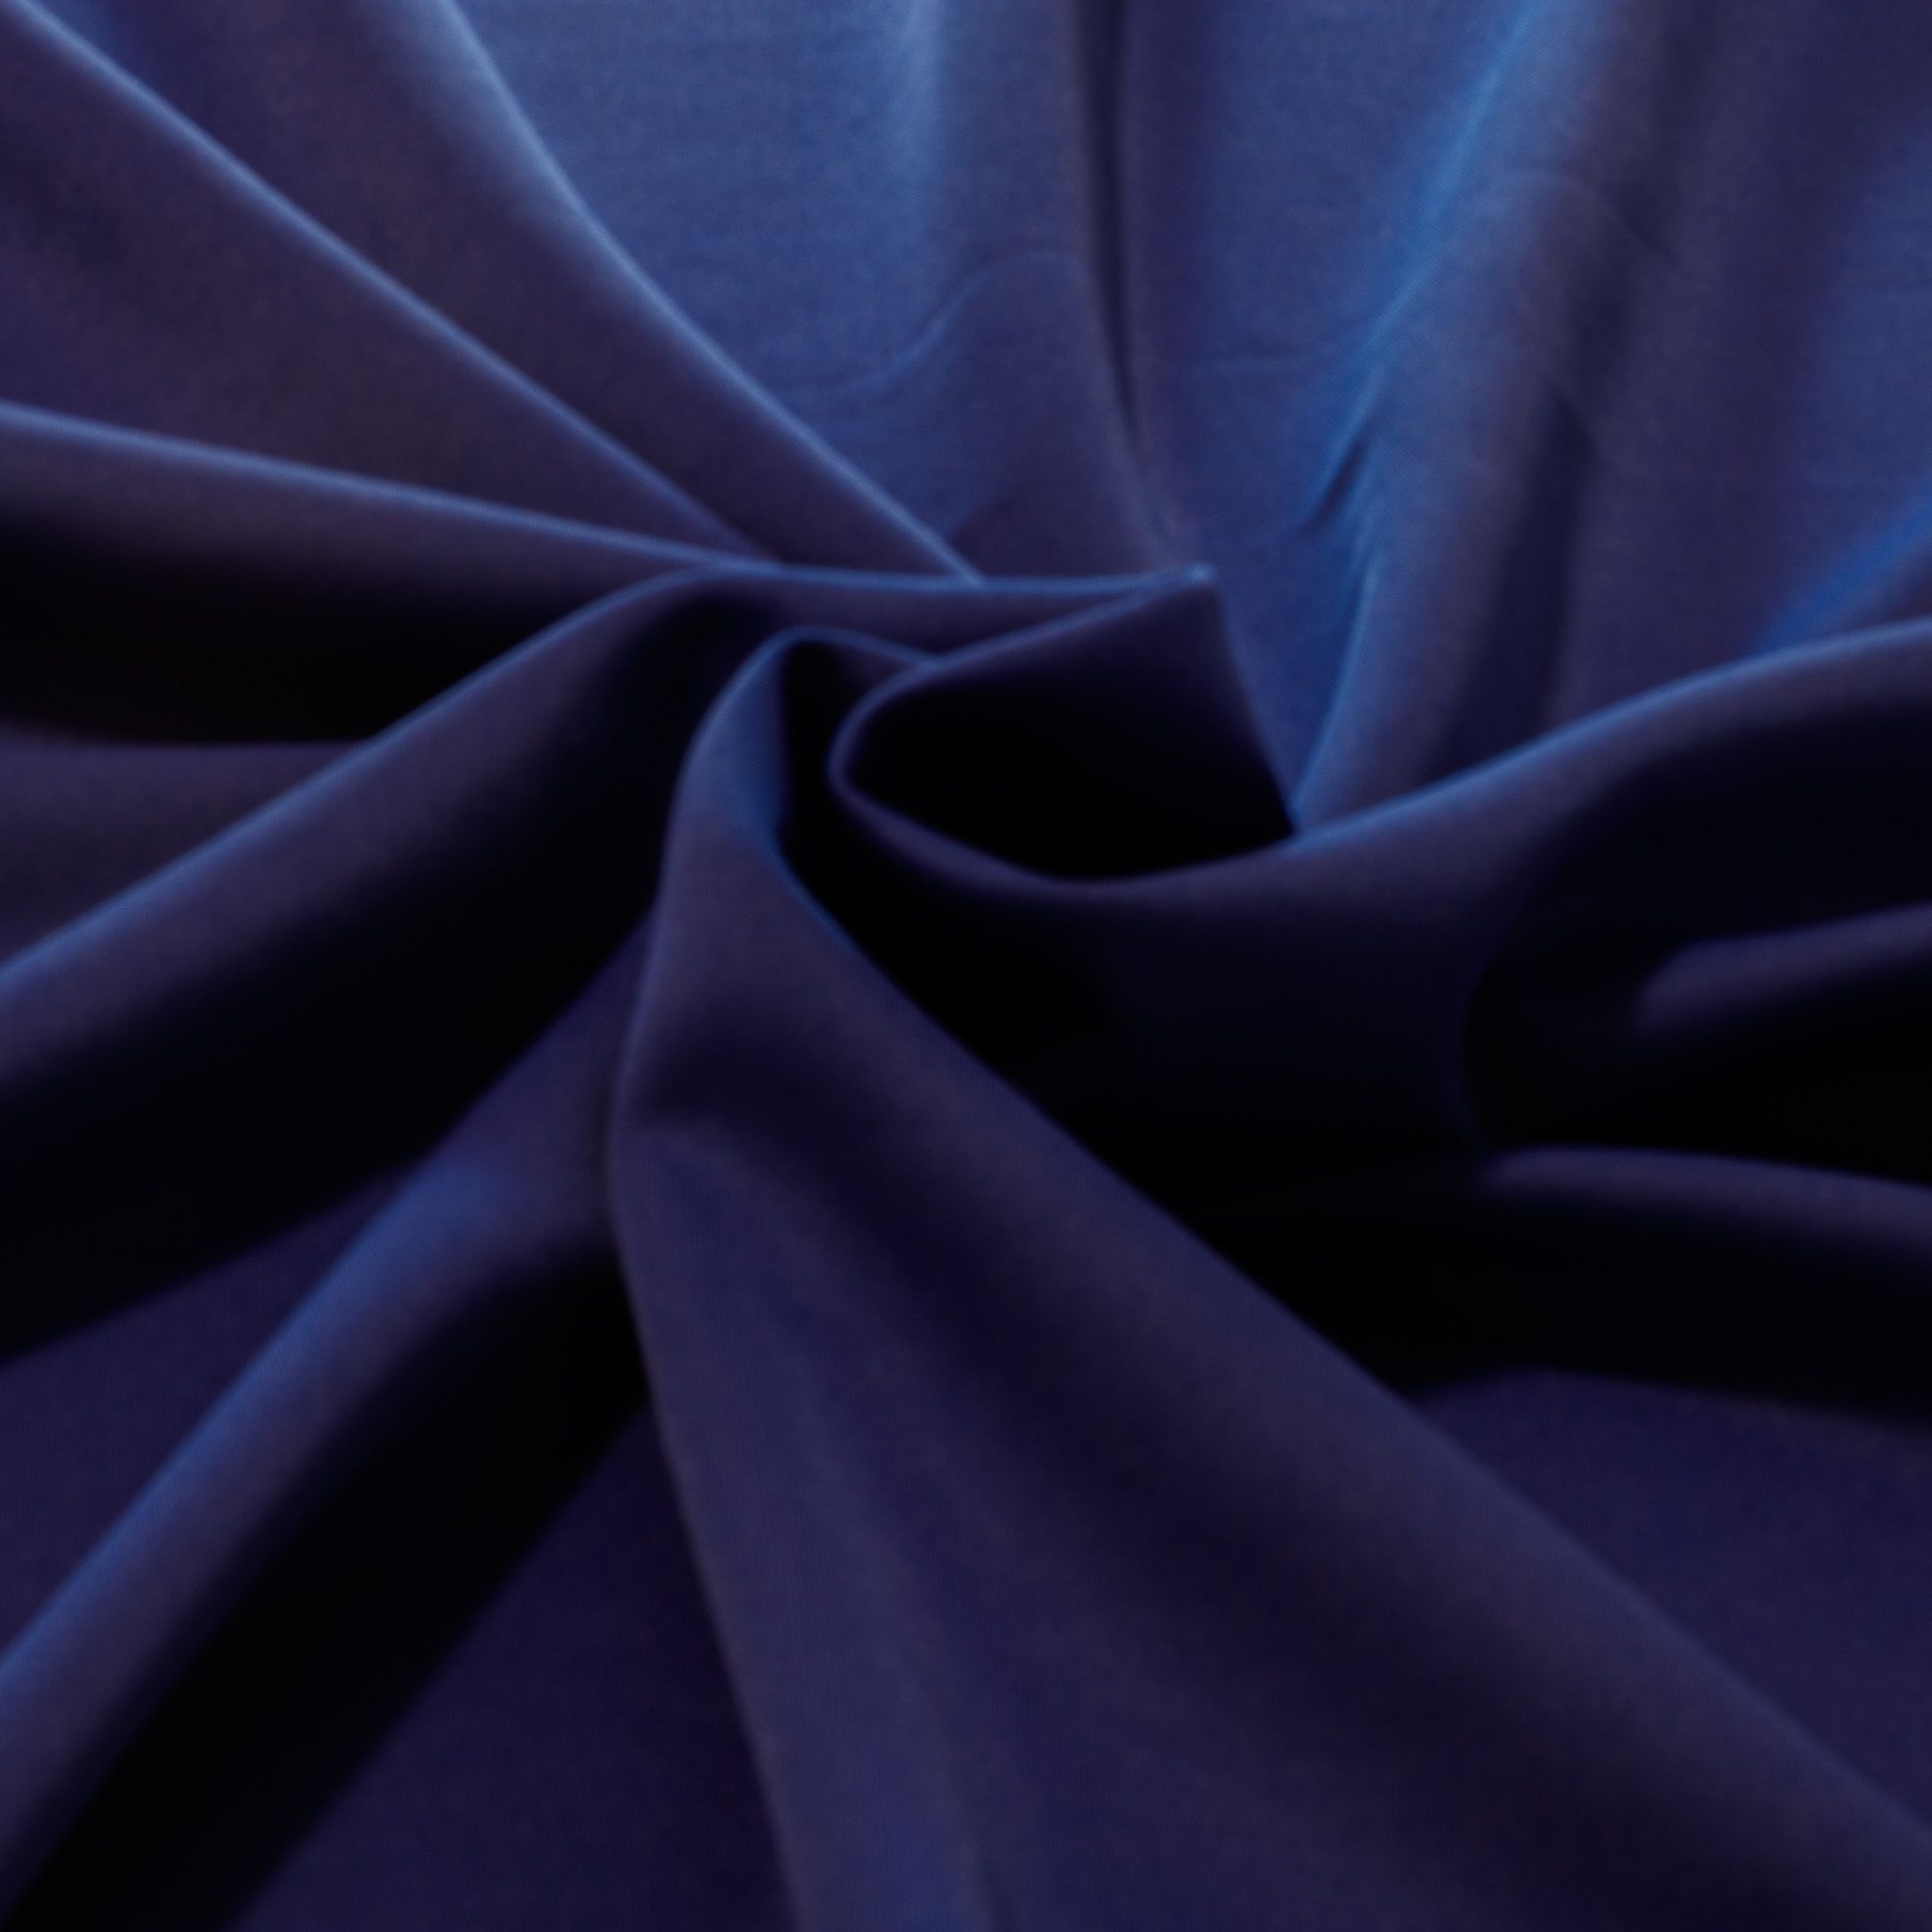 Tecido Malha Neoprene  95% Poliester 5% Elastano Azul/Royal